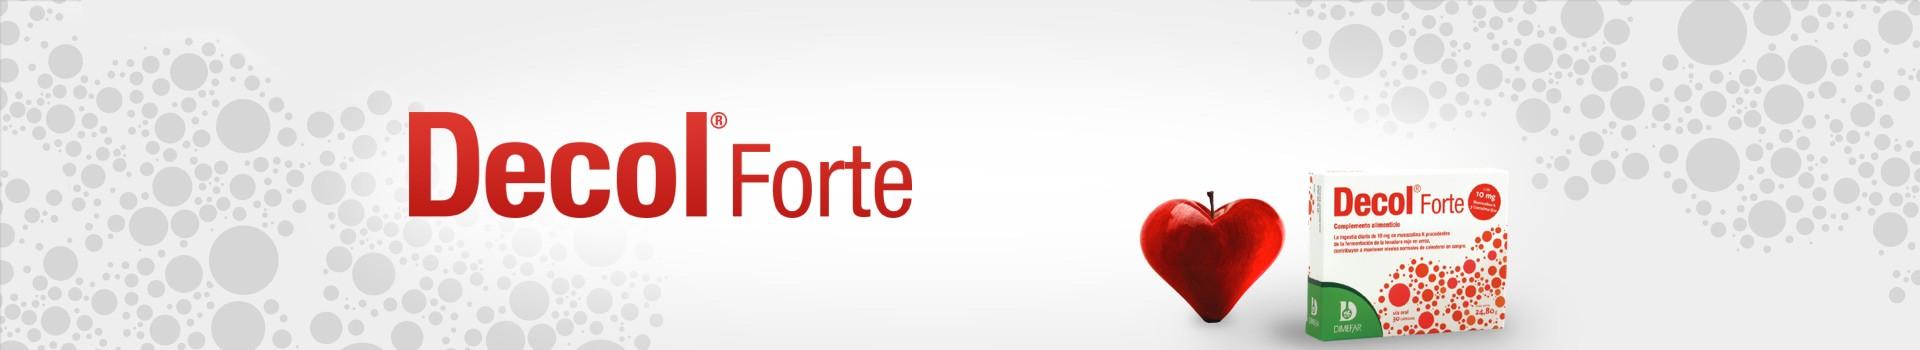 Decol Forte